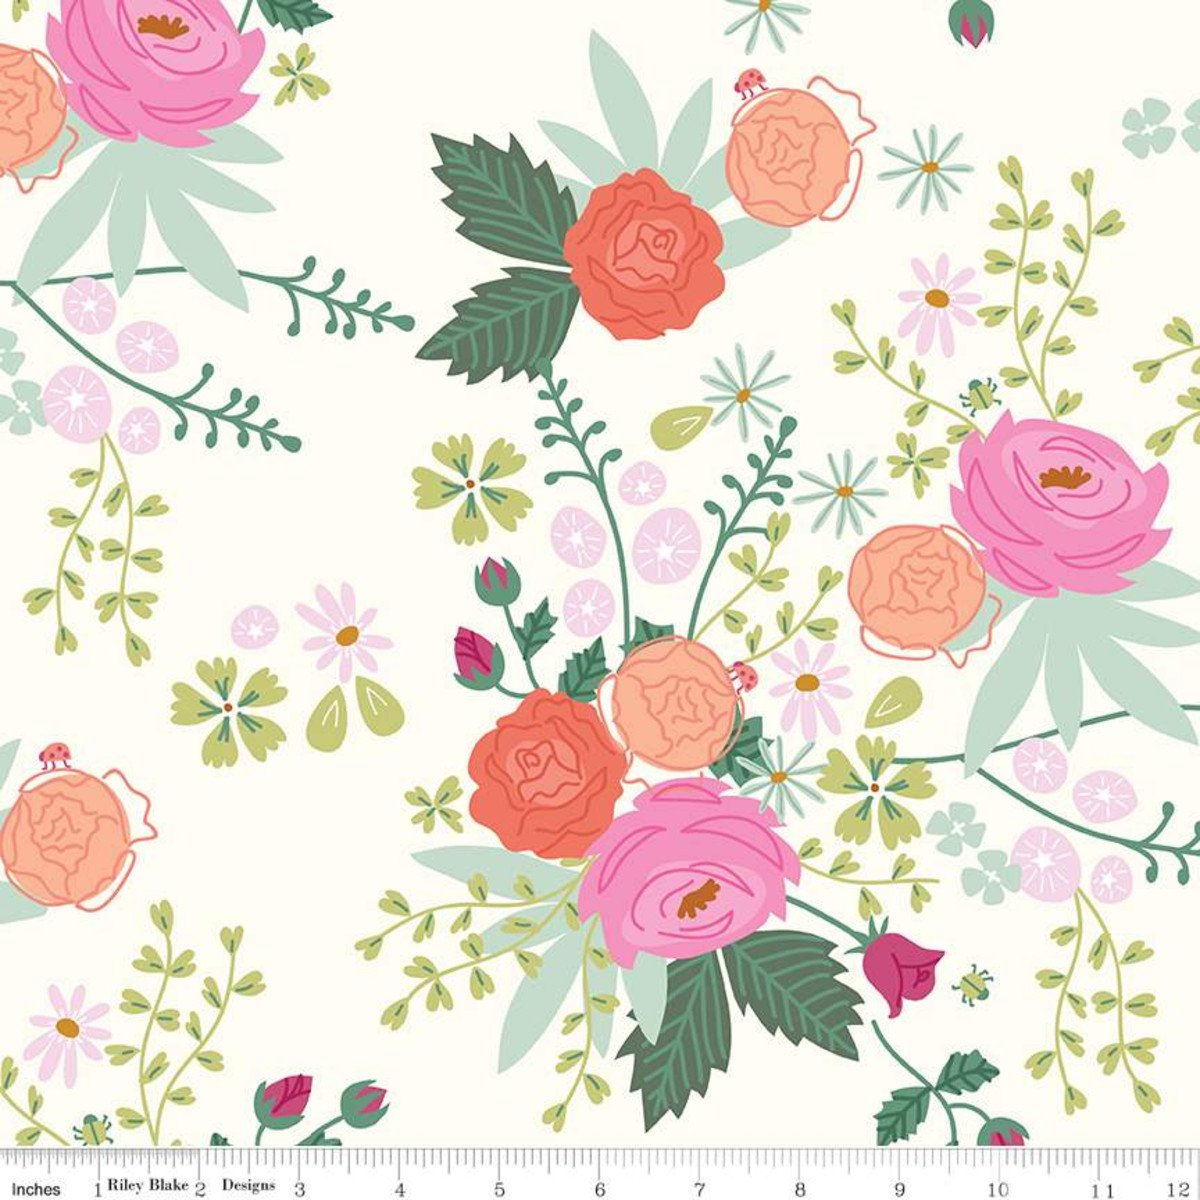 New Dawn Main: Cream - New Dawn - Citrus & Mint Designs - Riley Blake Designs